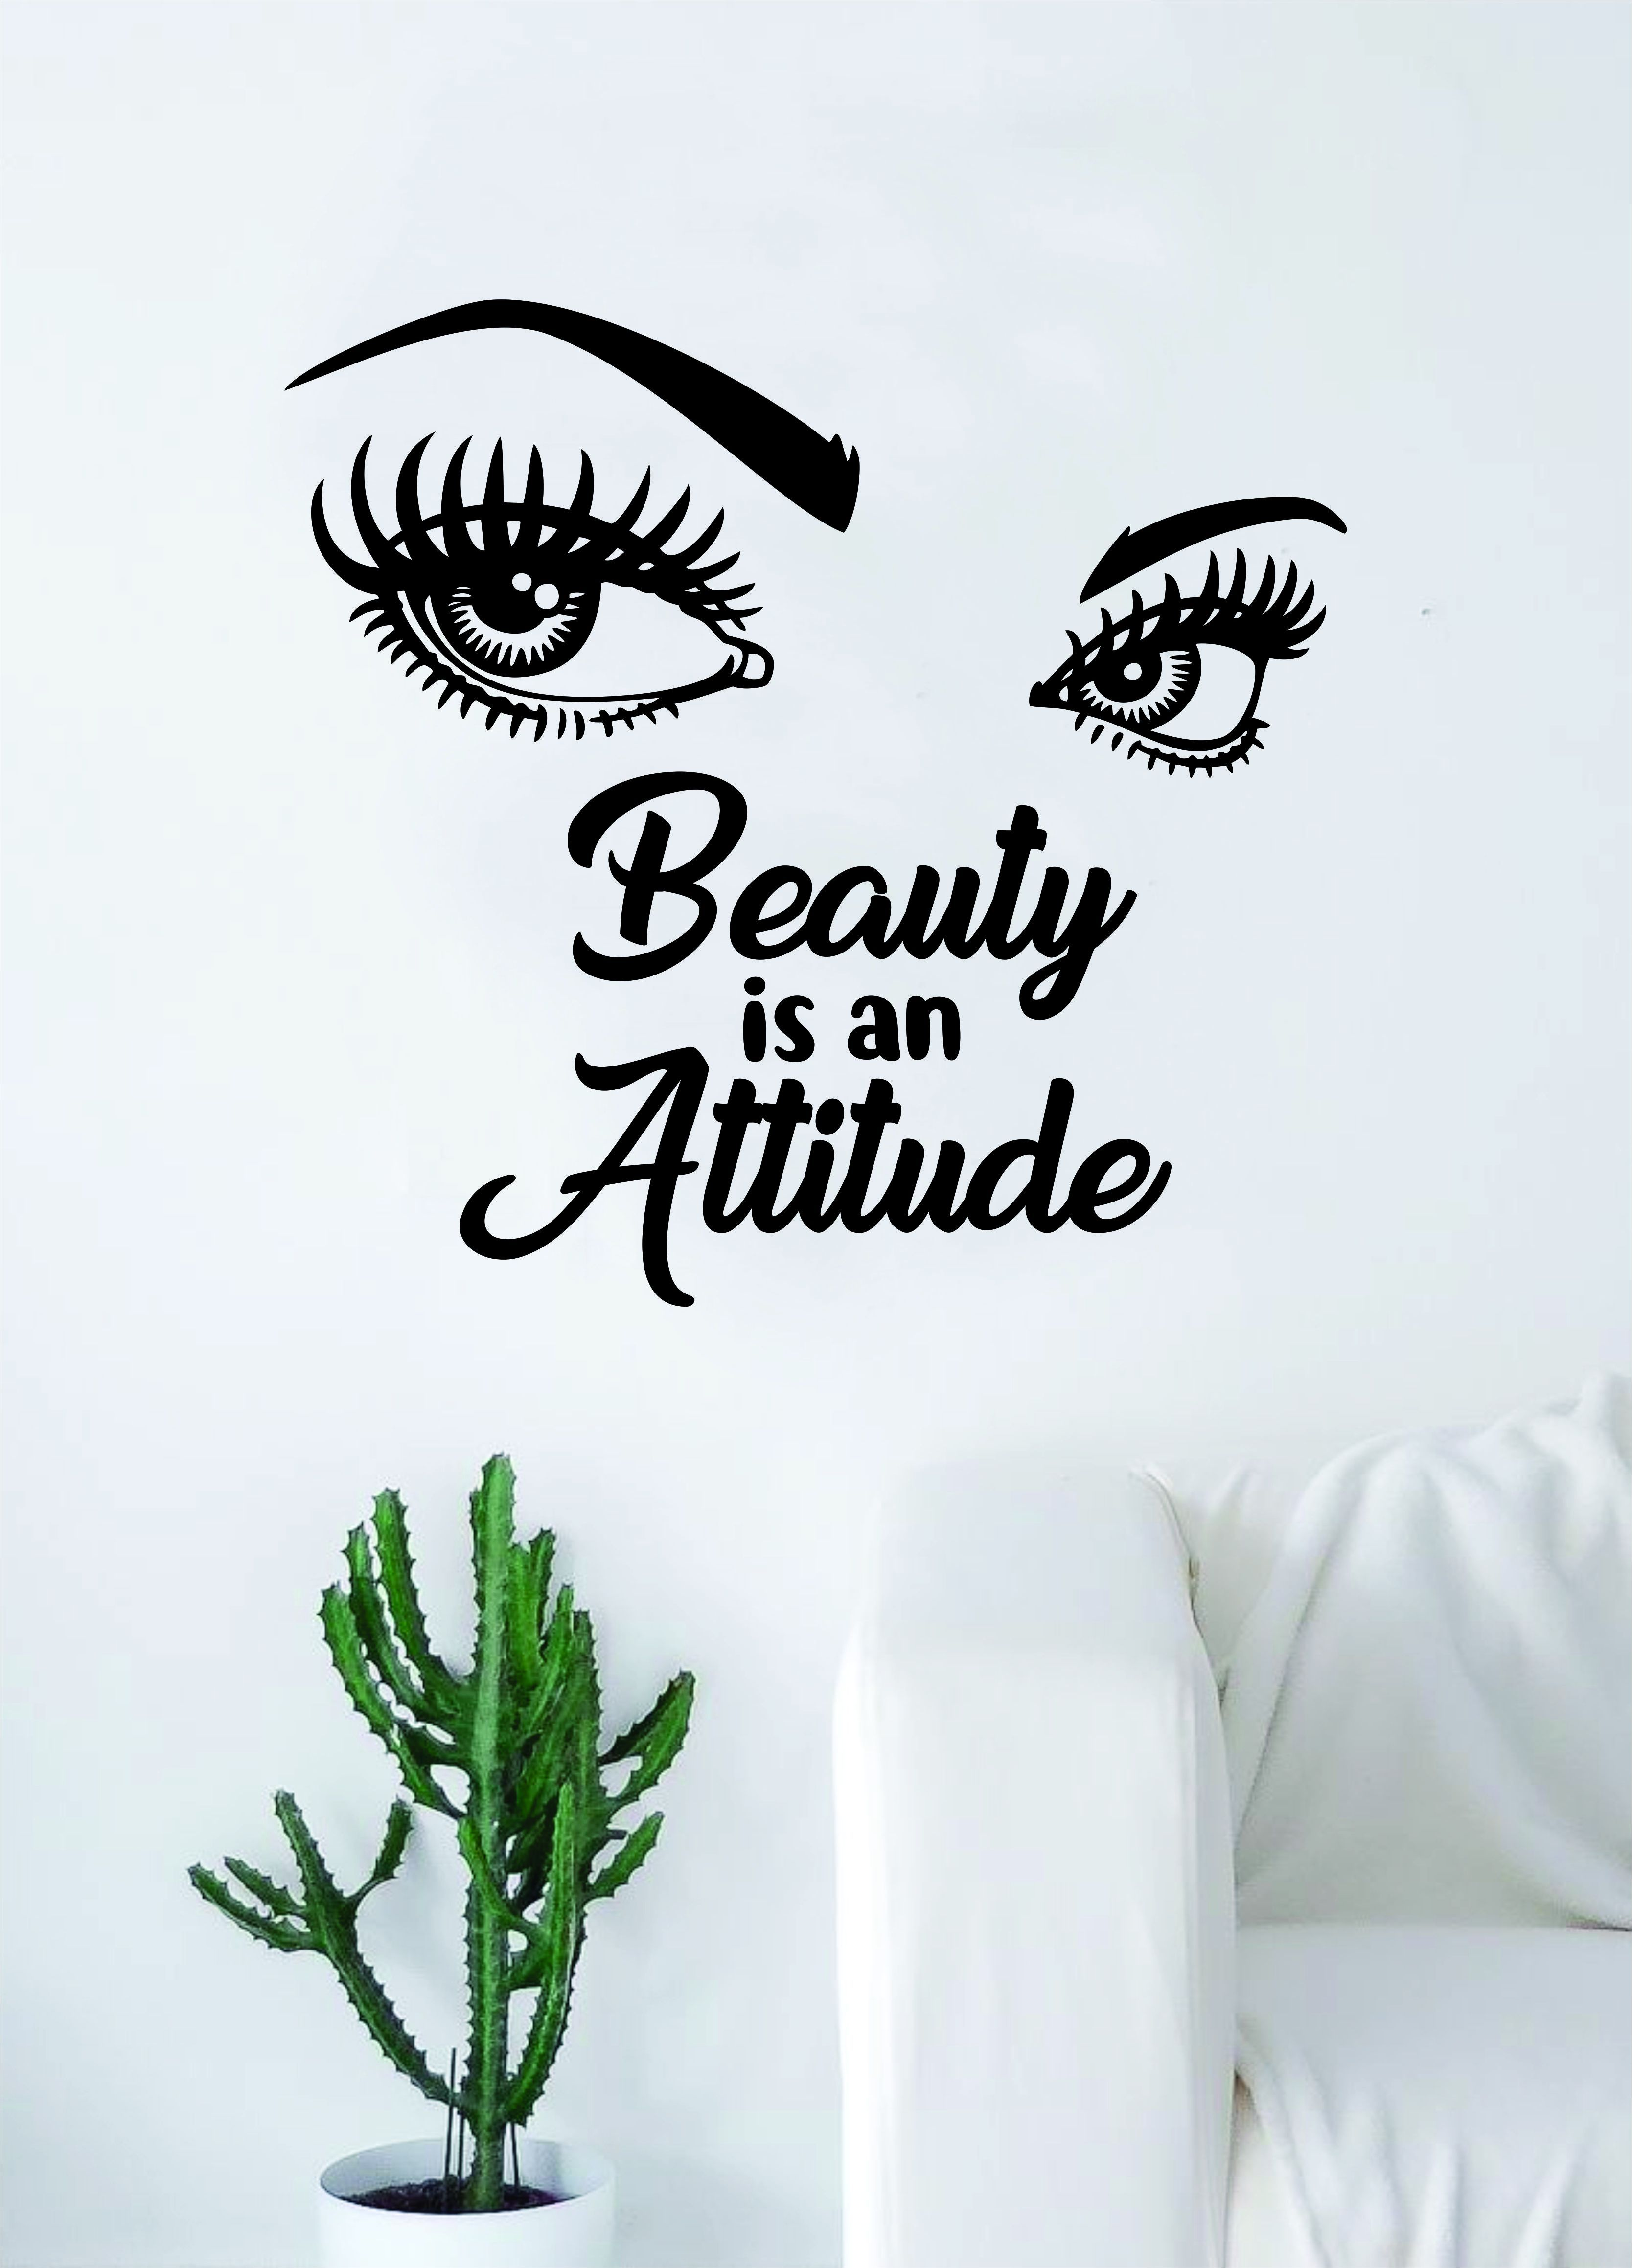 7e168052a79 Beauty is an Attitude Girl Eyes Quote Beautiful Design Decal Sticker Wall  Vinyl Decor Art Eyebrows Eyelashes Lashes Make Up Cosmetics Beauty Salon MUA